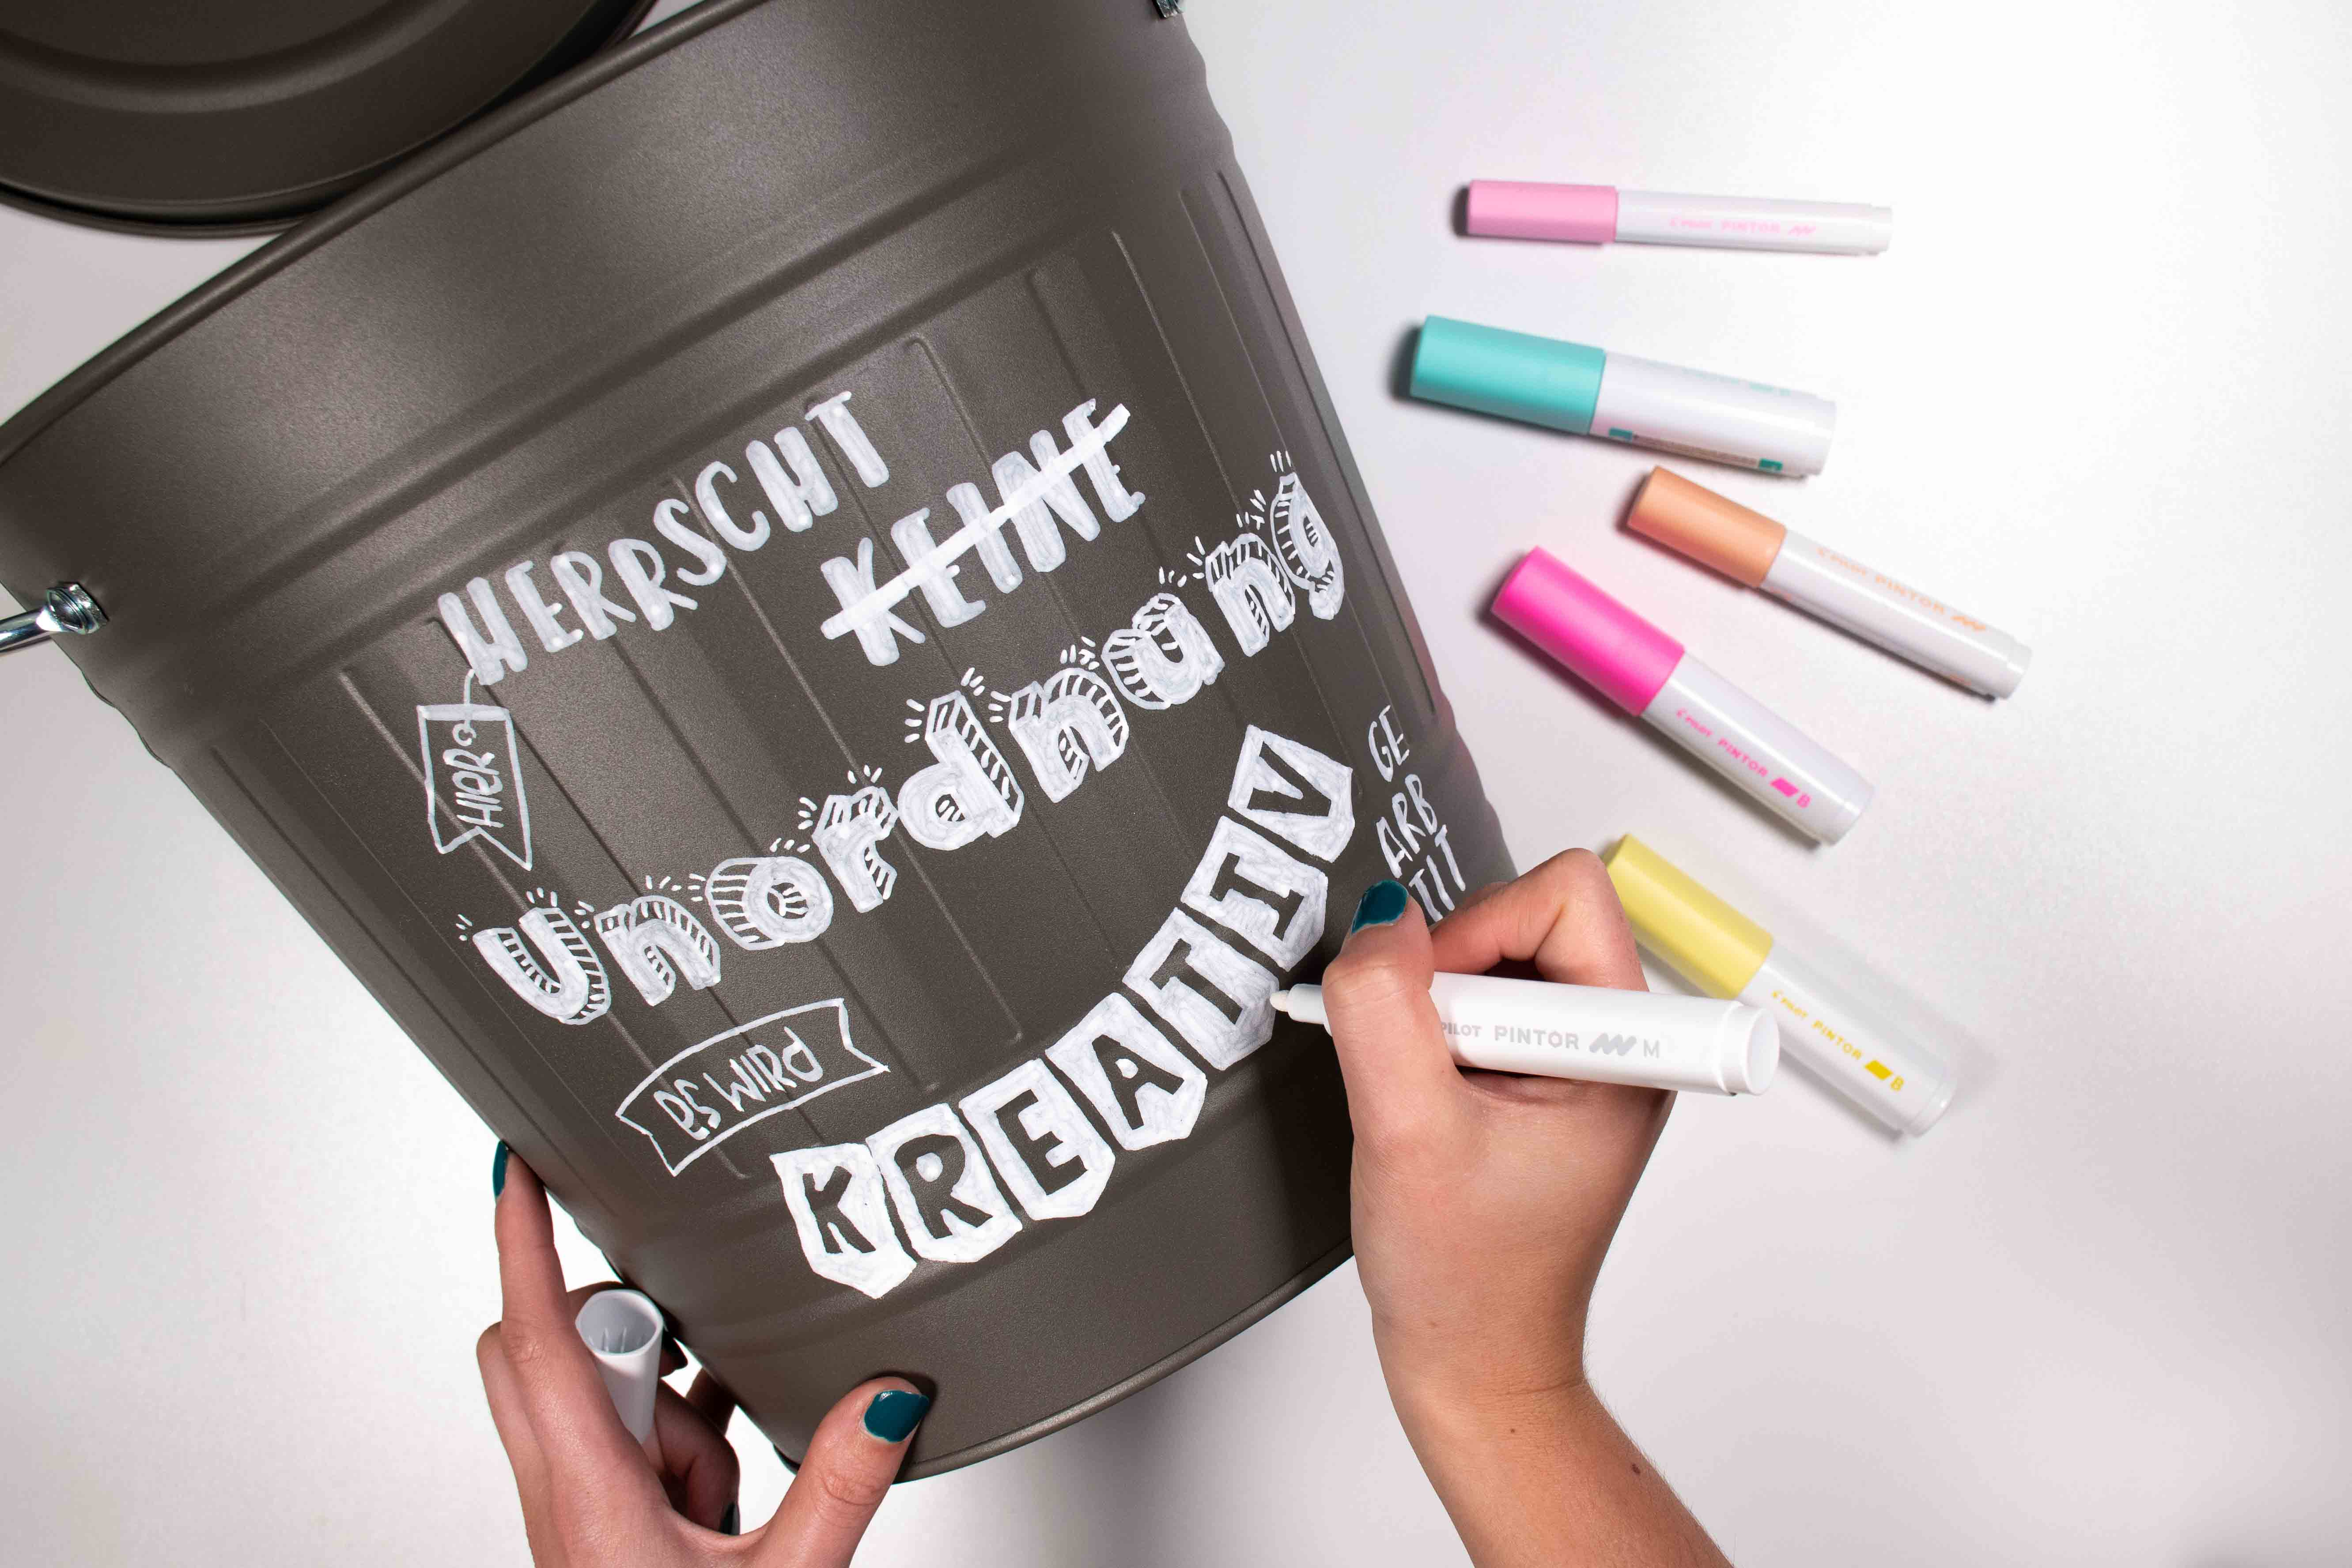 DIY Anleitung Upcycling Mülltonne mit Pilot Pintor Markern